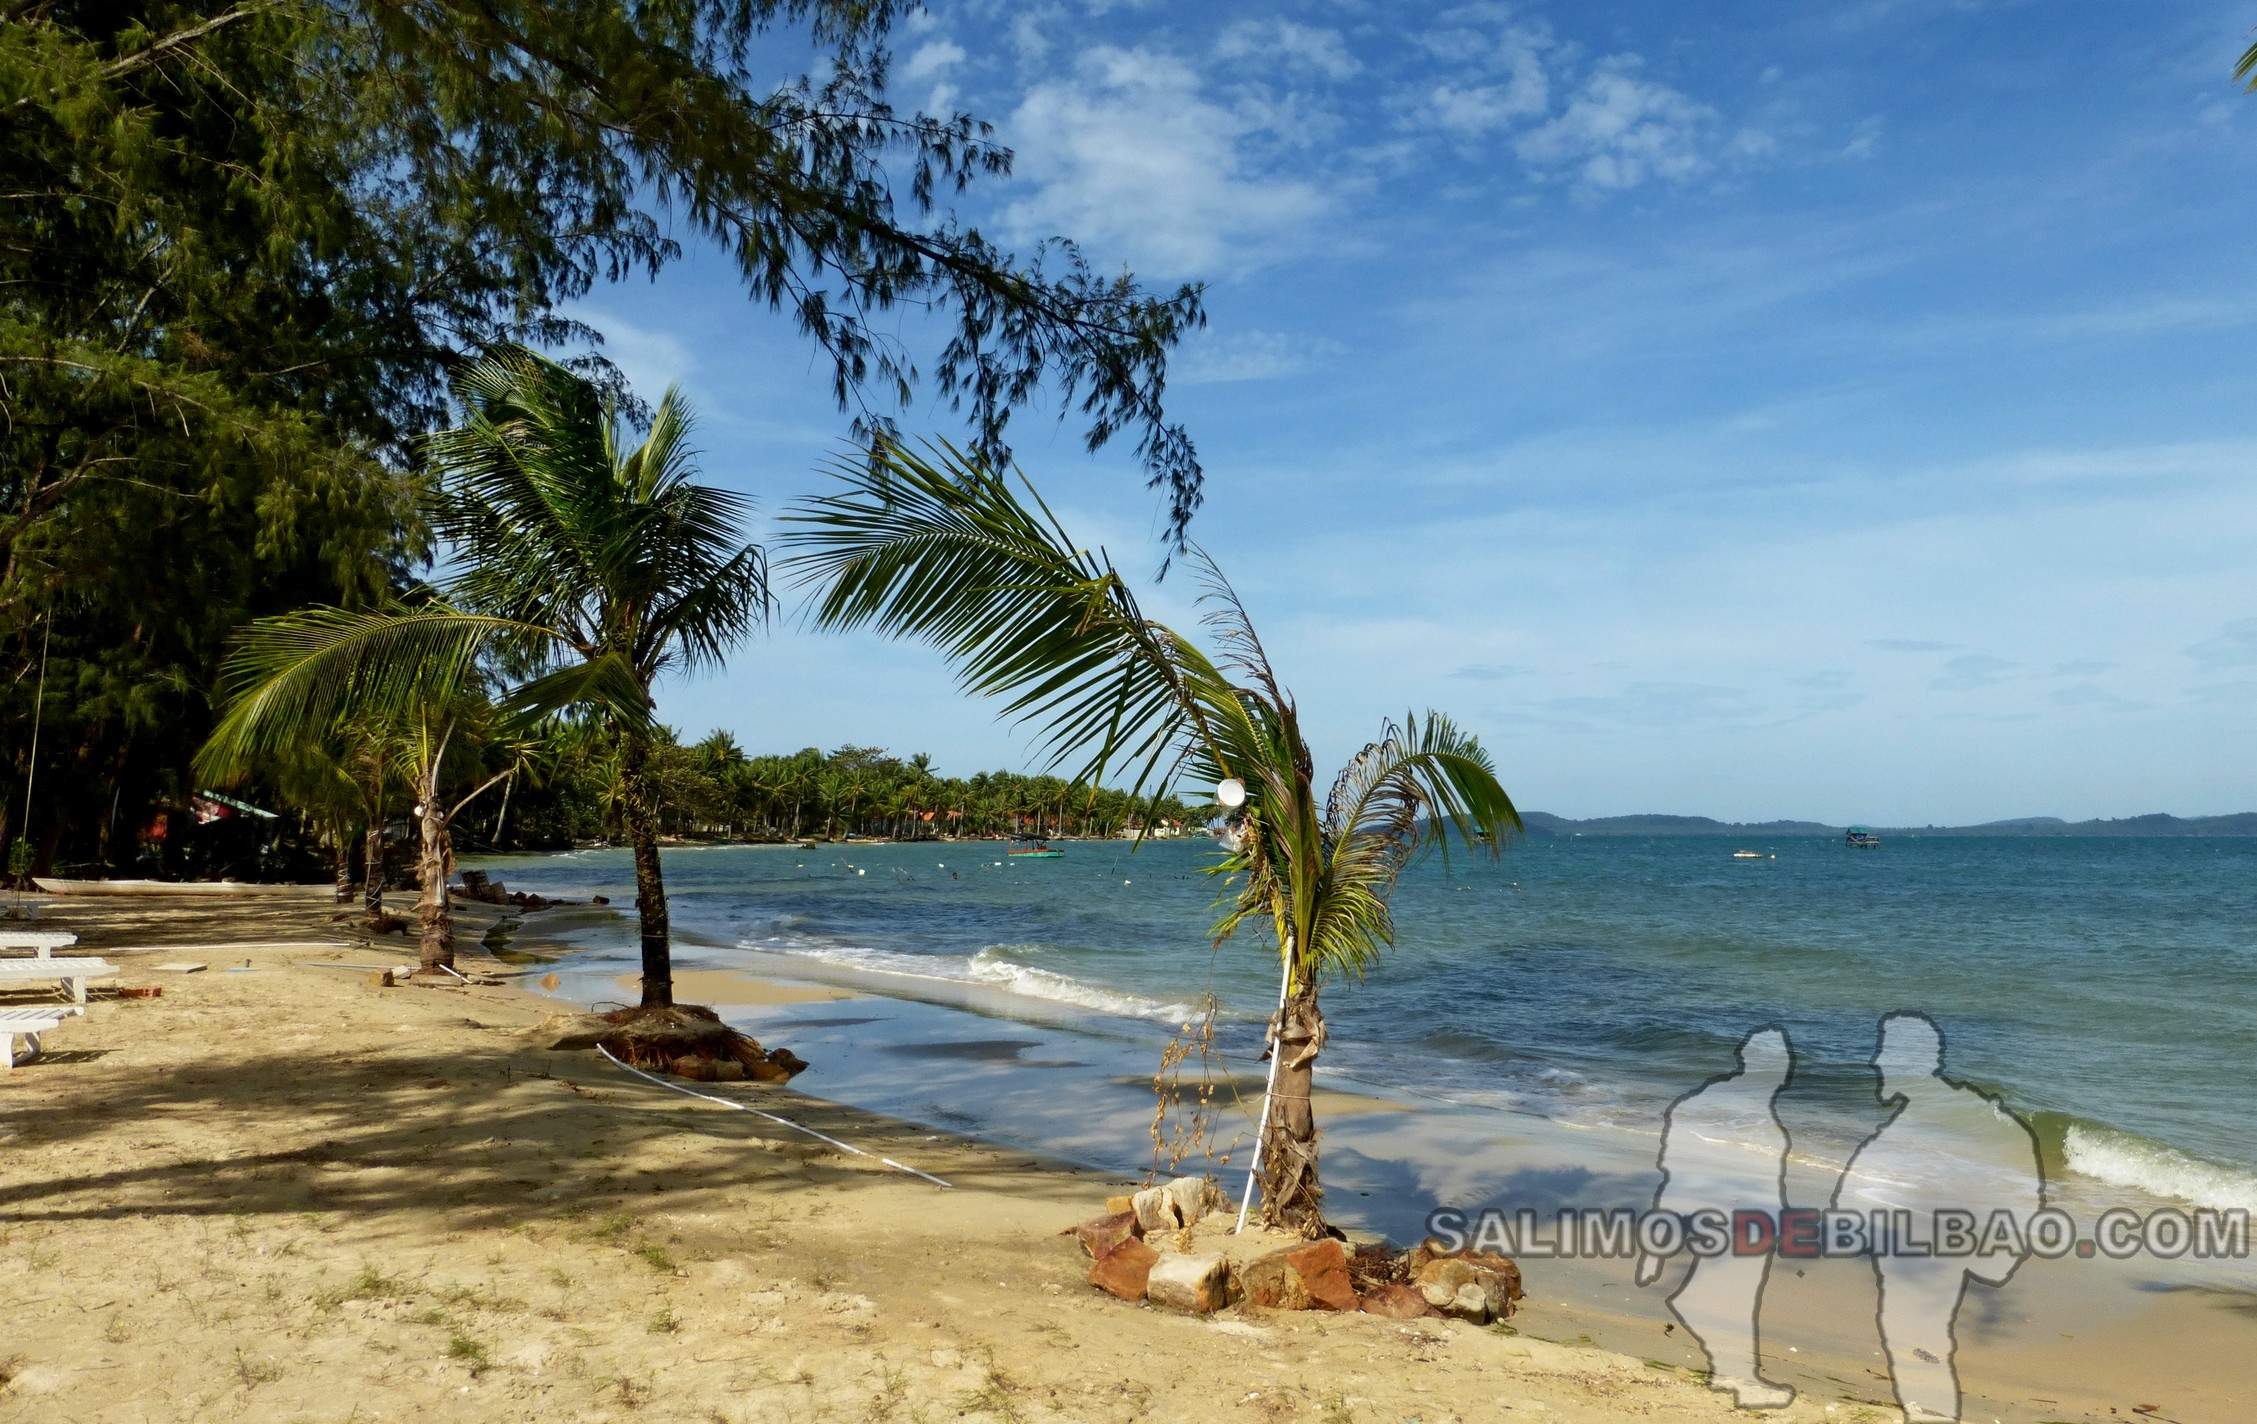 0141. Playa Muy Ganh Dau, Noreste de Phu Quoc